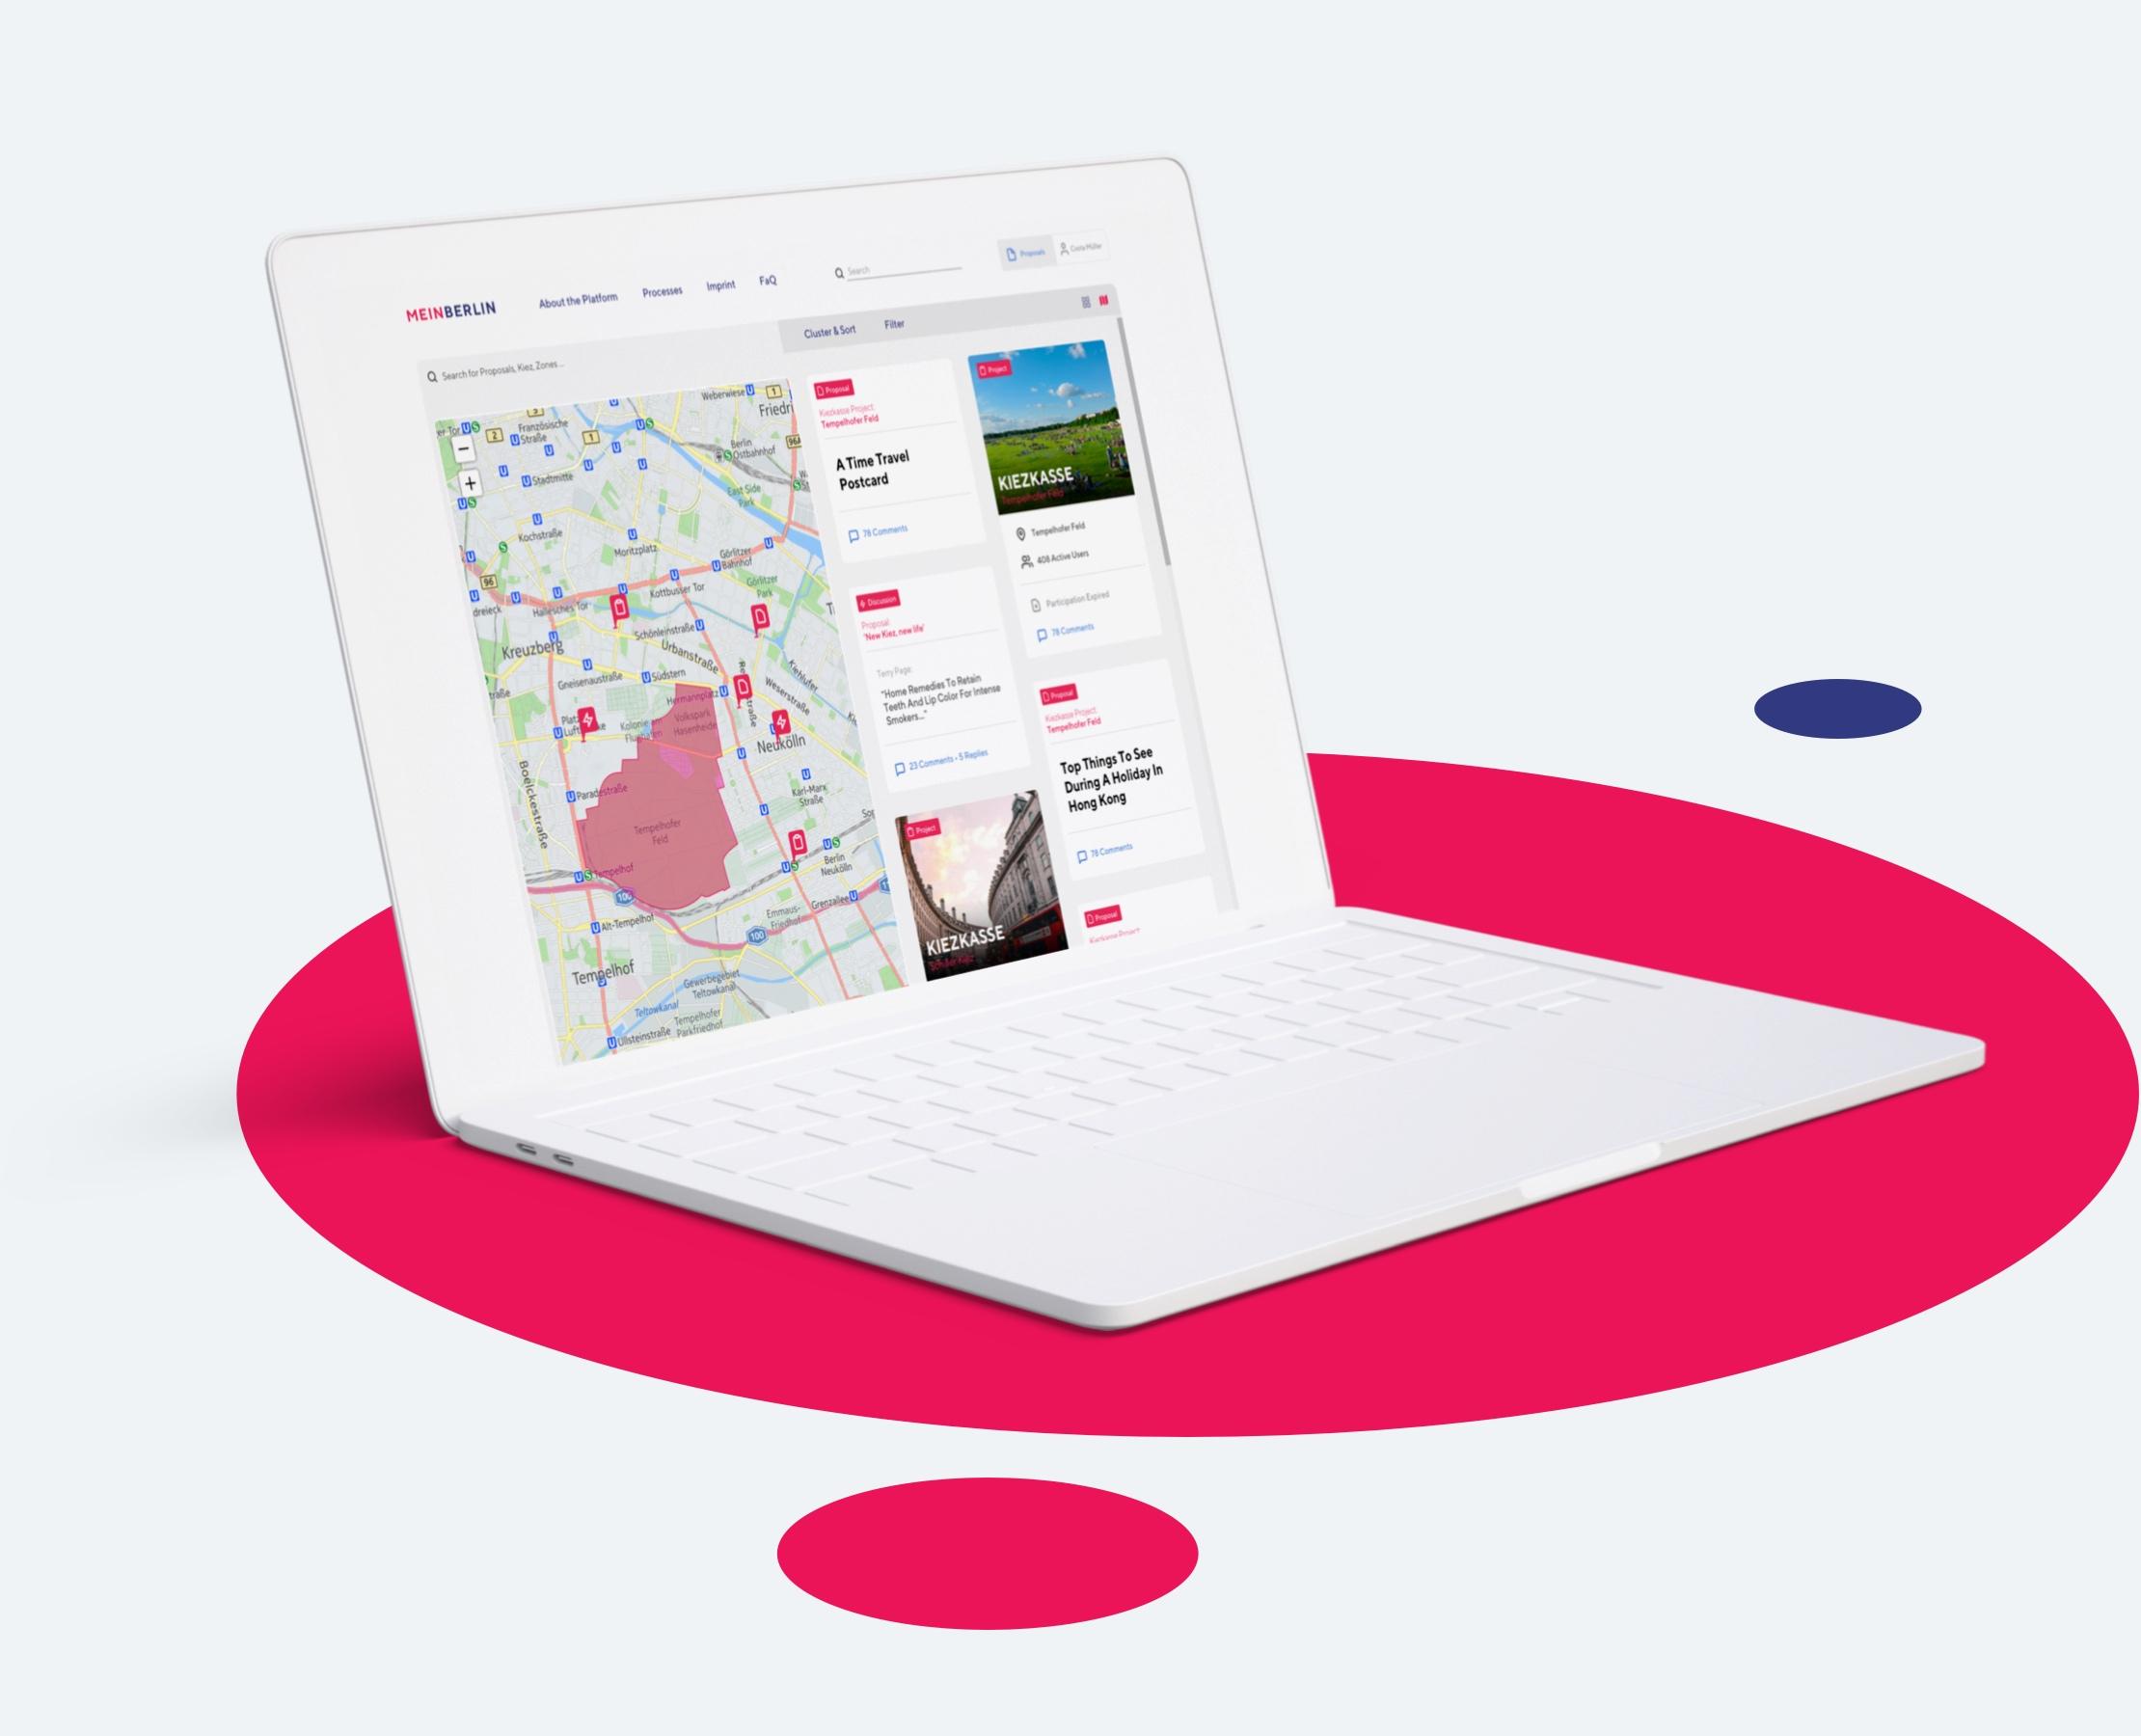 Adhocracy Software design by Manu Franco - UX